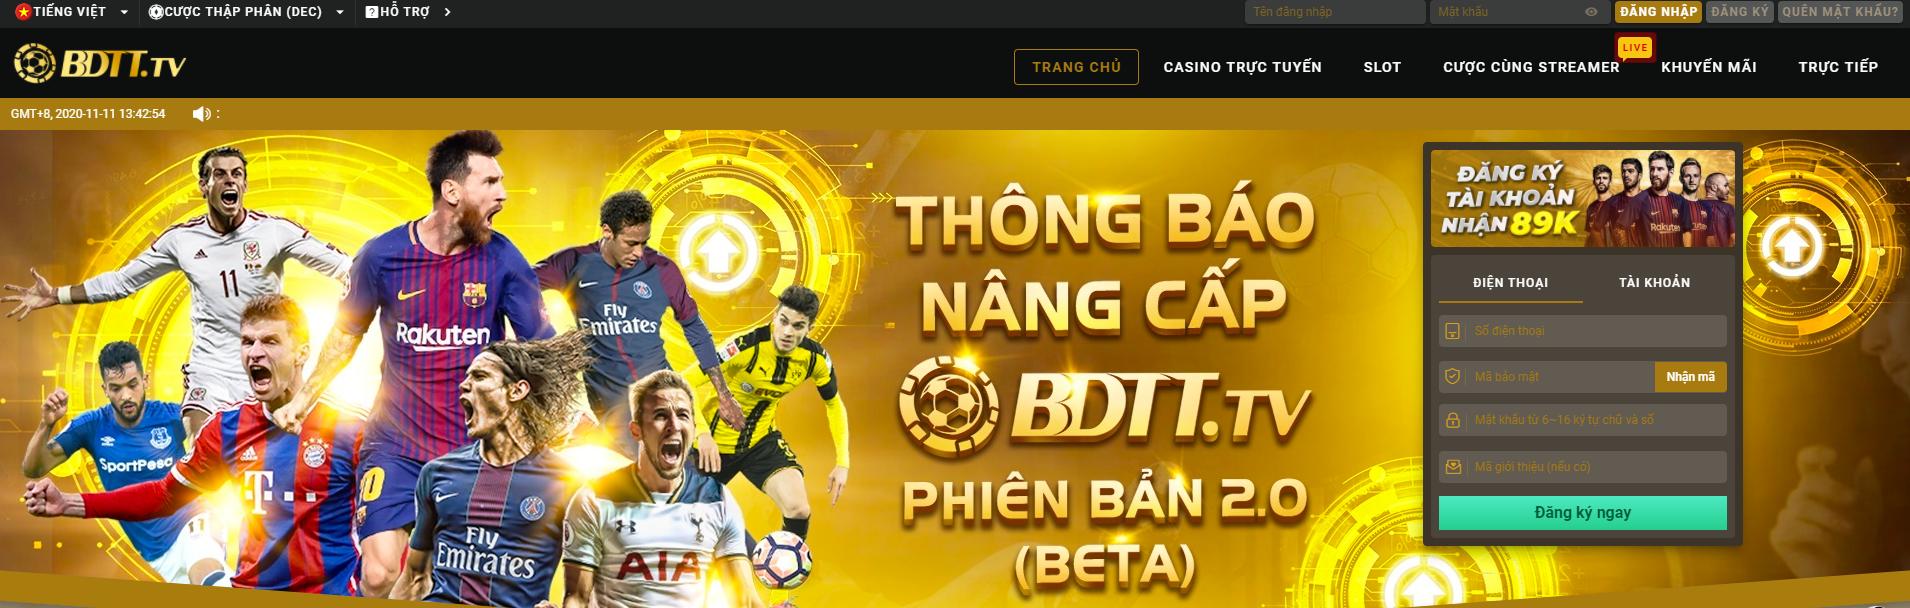 BDTT.tv